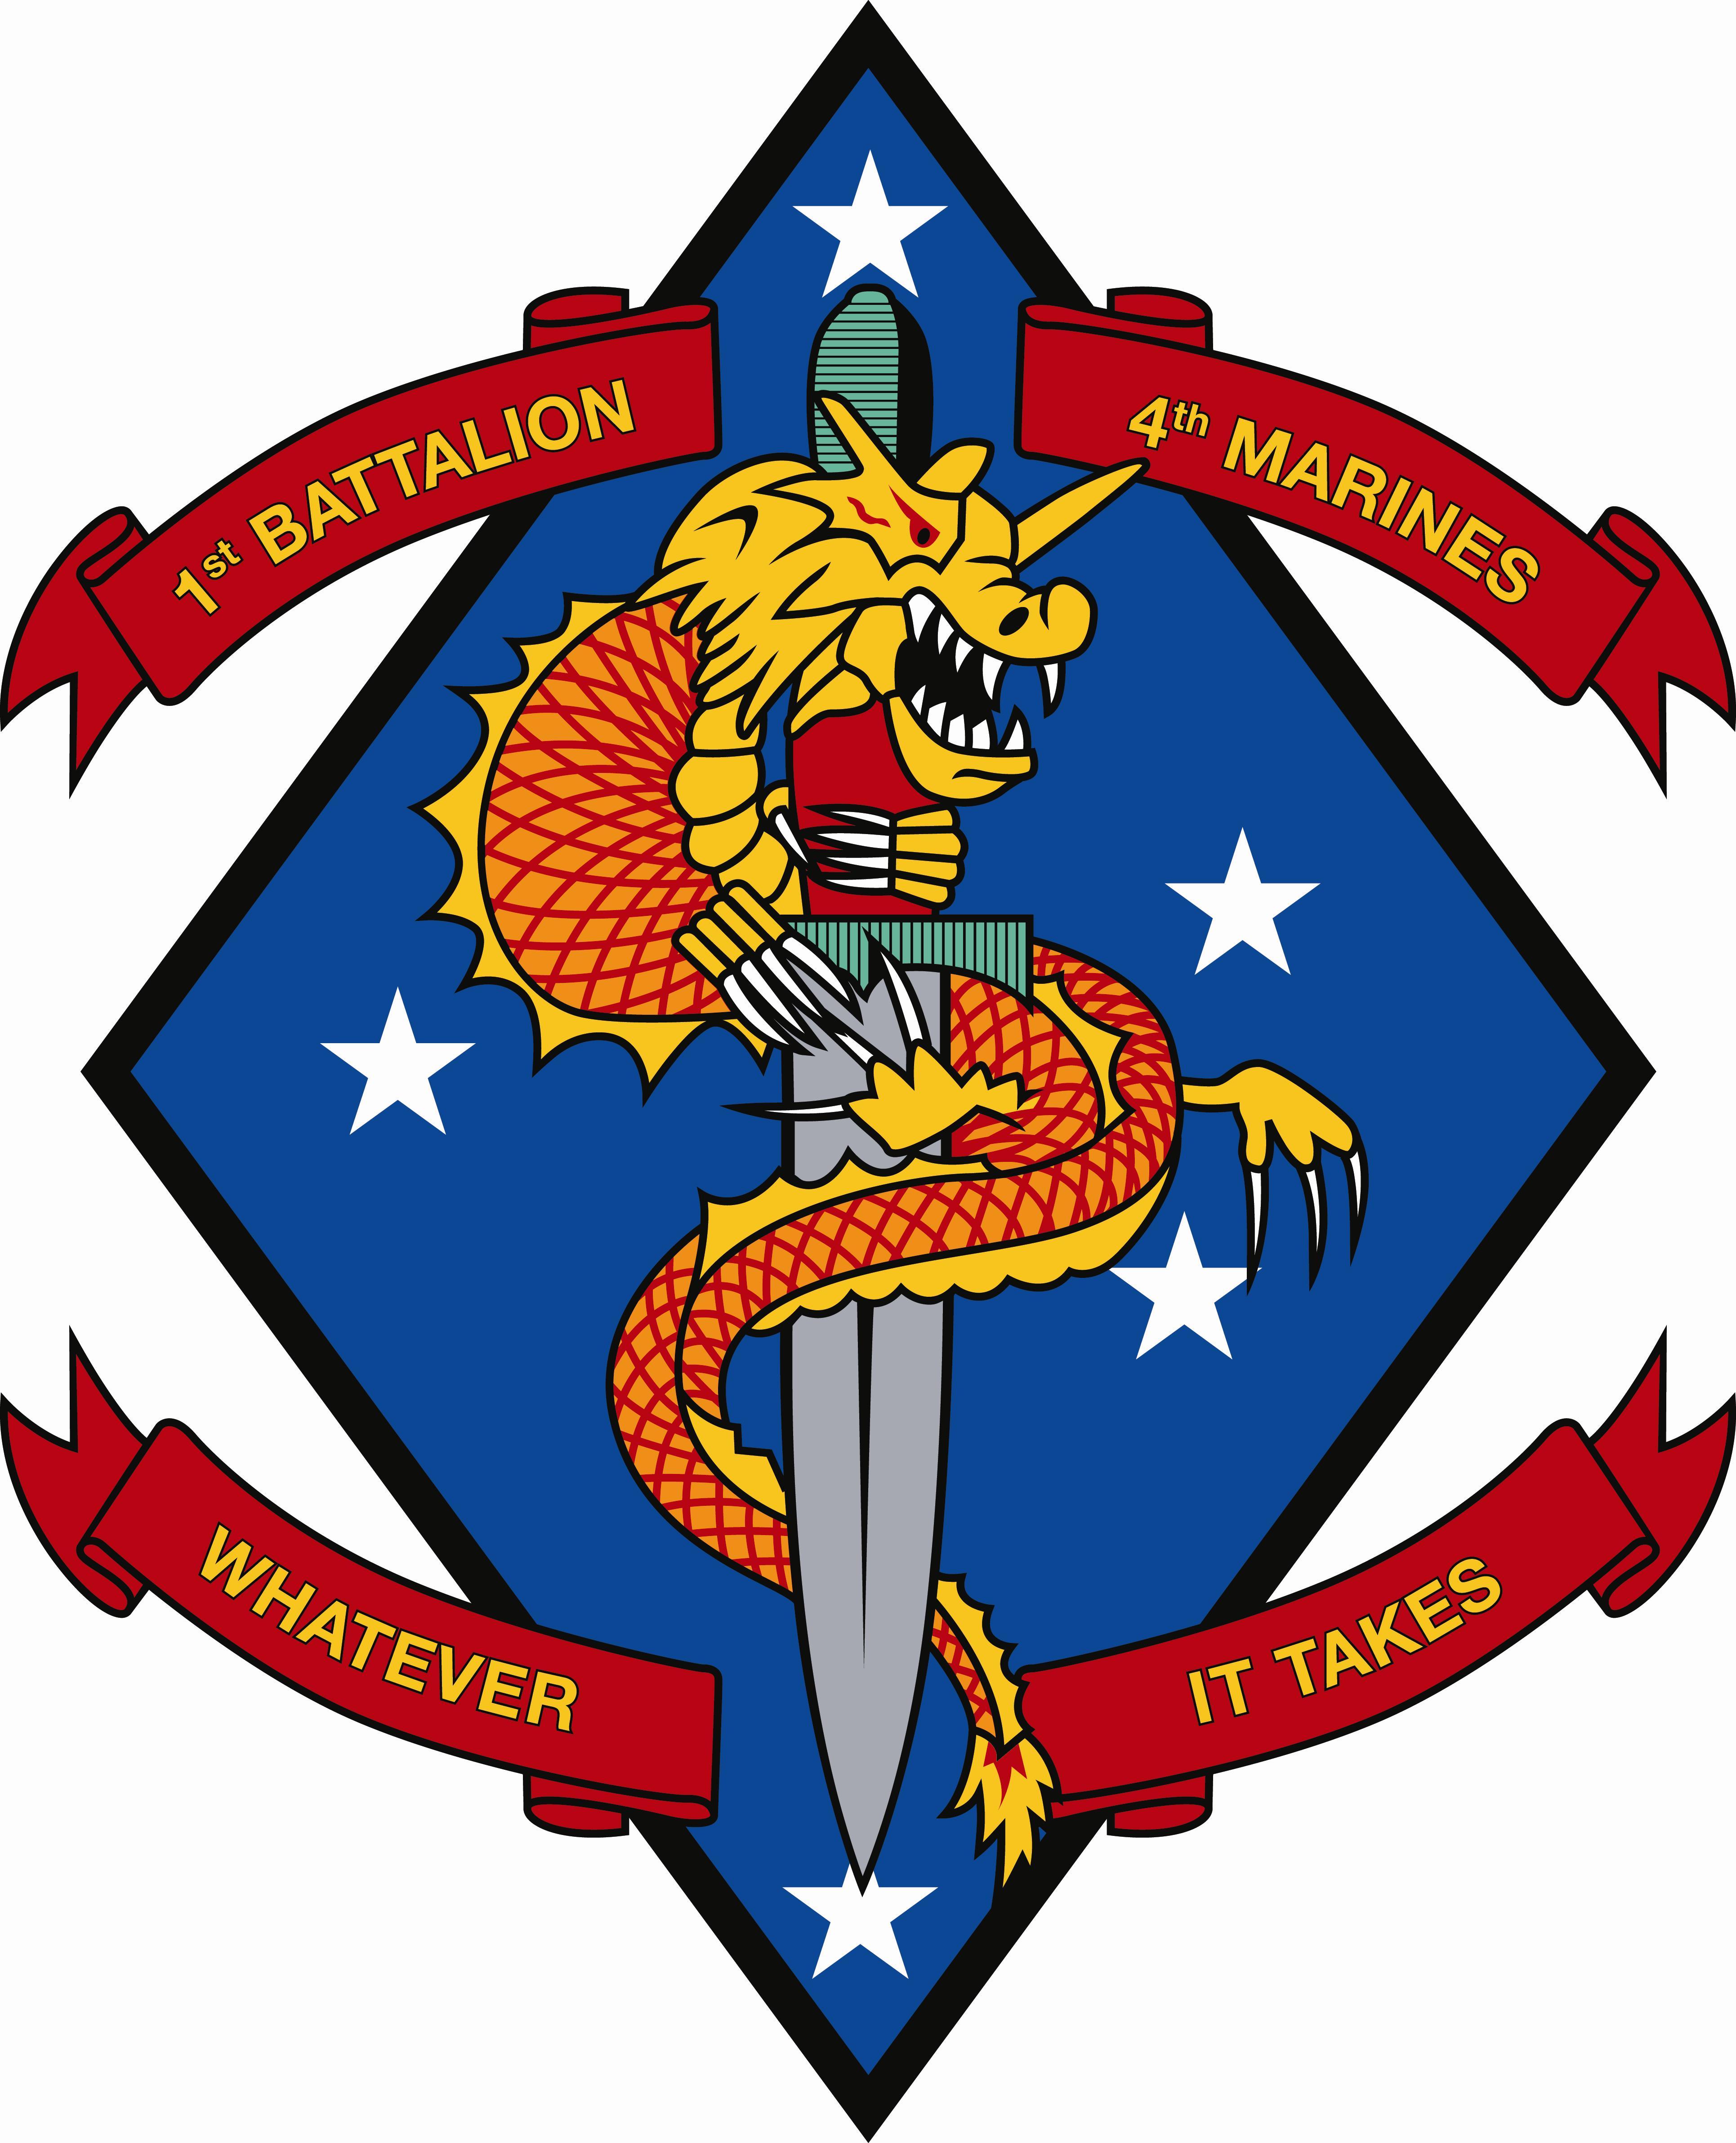 USMC 1st Battalion/4th Marines current logo round PATCH 1 ...  |1st Battalion 4th Marines Logo